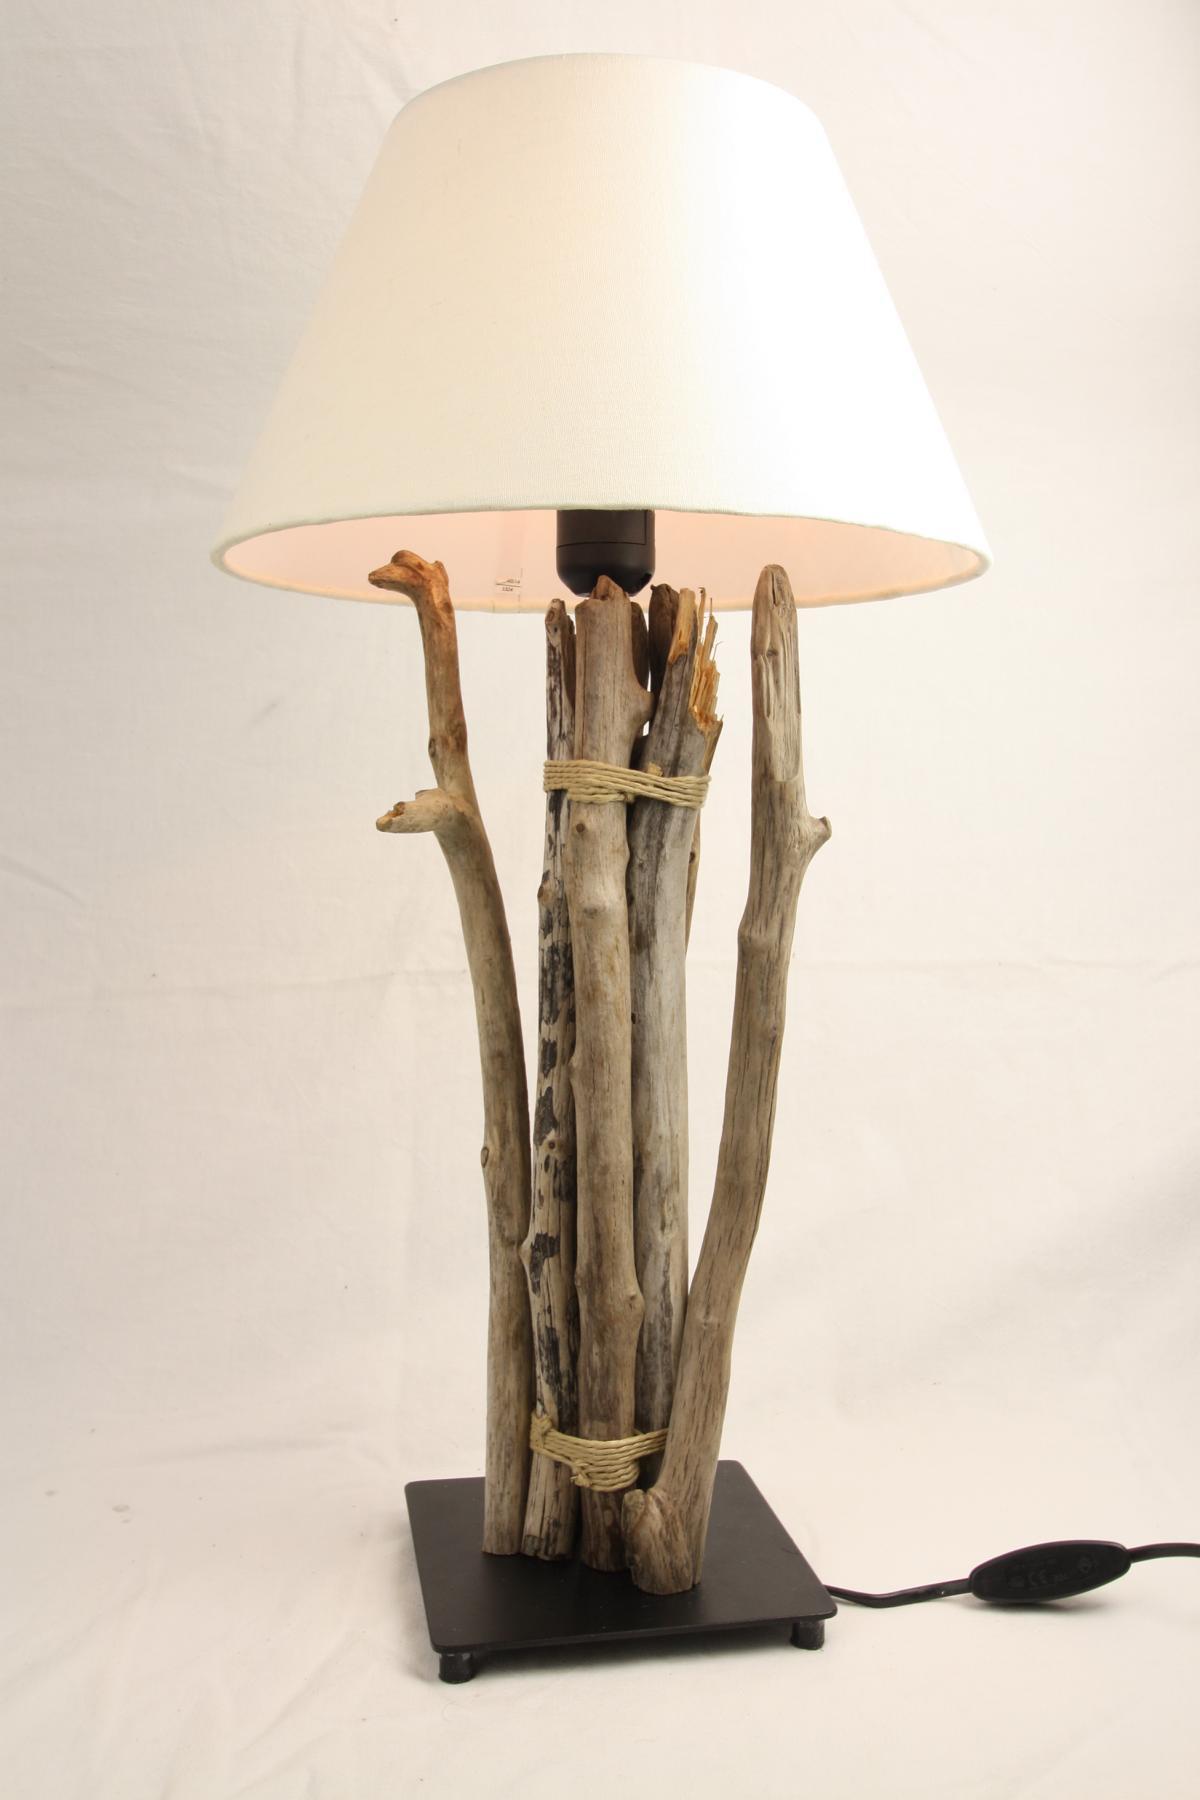 treibholz lampe einmalige treibholz lampen treibholz. Black Bedroom Furniture Sets. Home Design Ideas